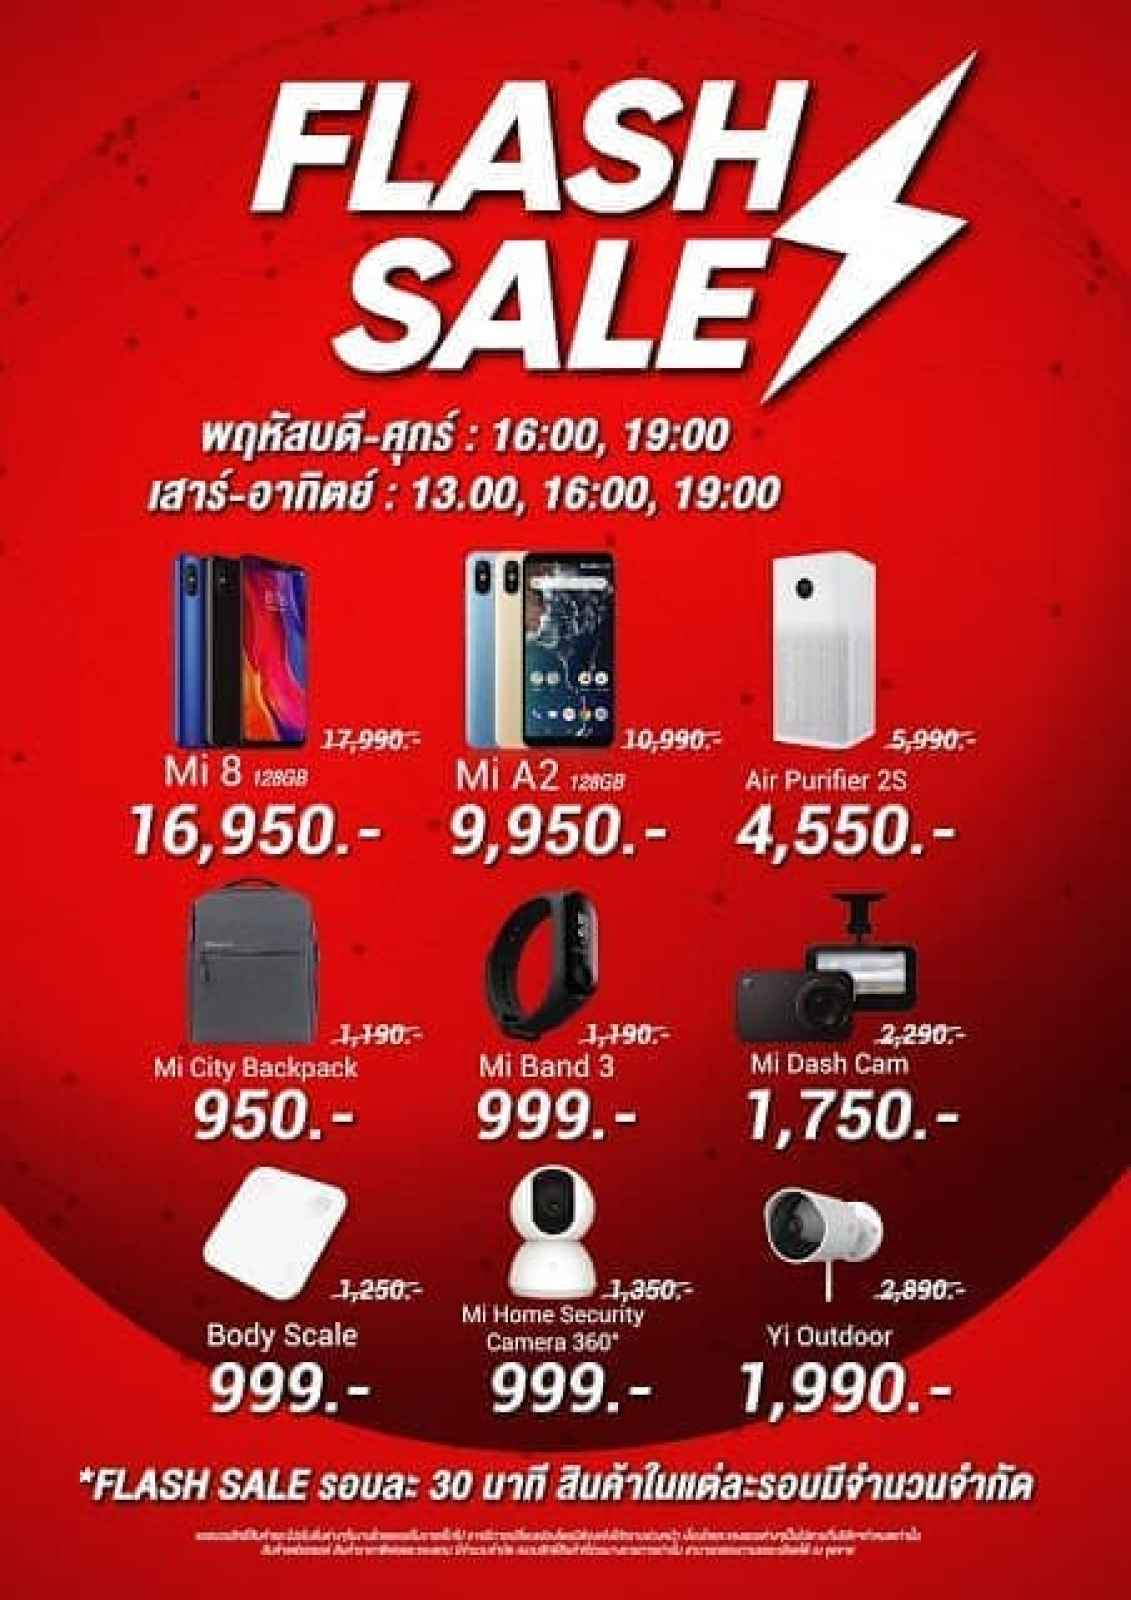 - 20180926 TME Flash Sale 2 - Mi Store by Fanslink  จัดโปรโมชั่น ลดสูงสุดถึง 30% ในงาน TME 2018